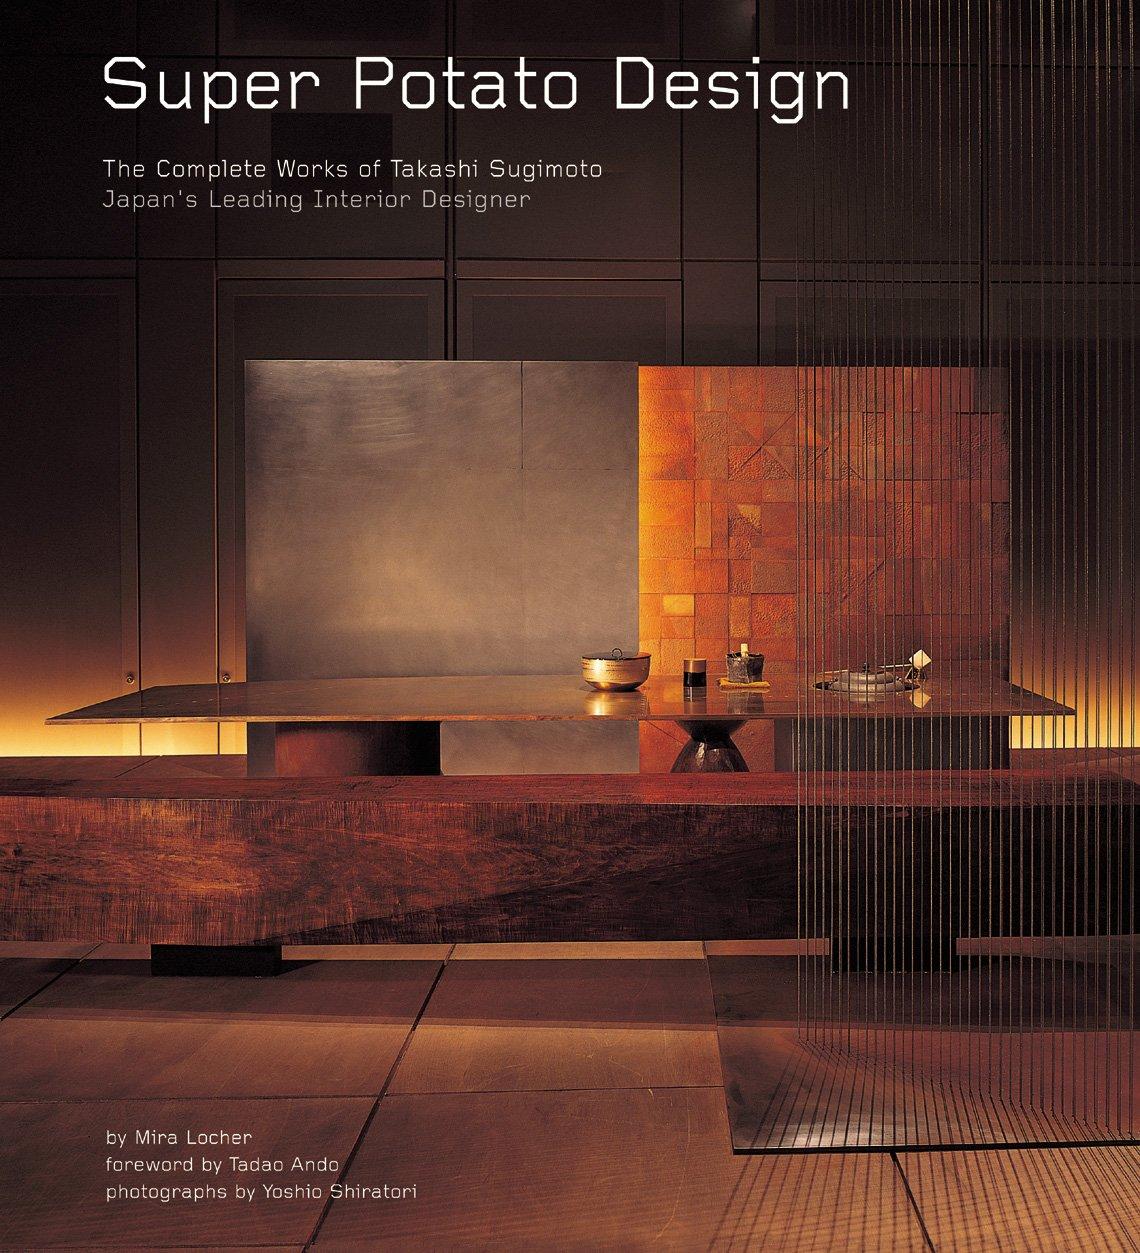 Super Potato Design: The Complete Works of Takashi Sugimoto: Japan's Leading Interior Designer PDF